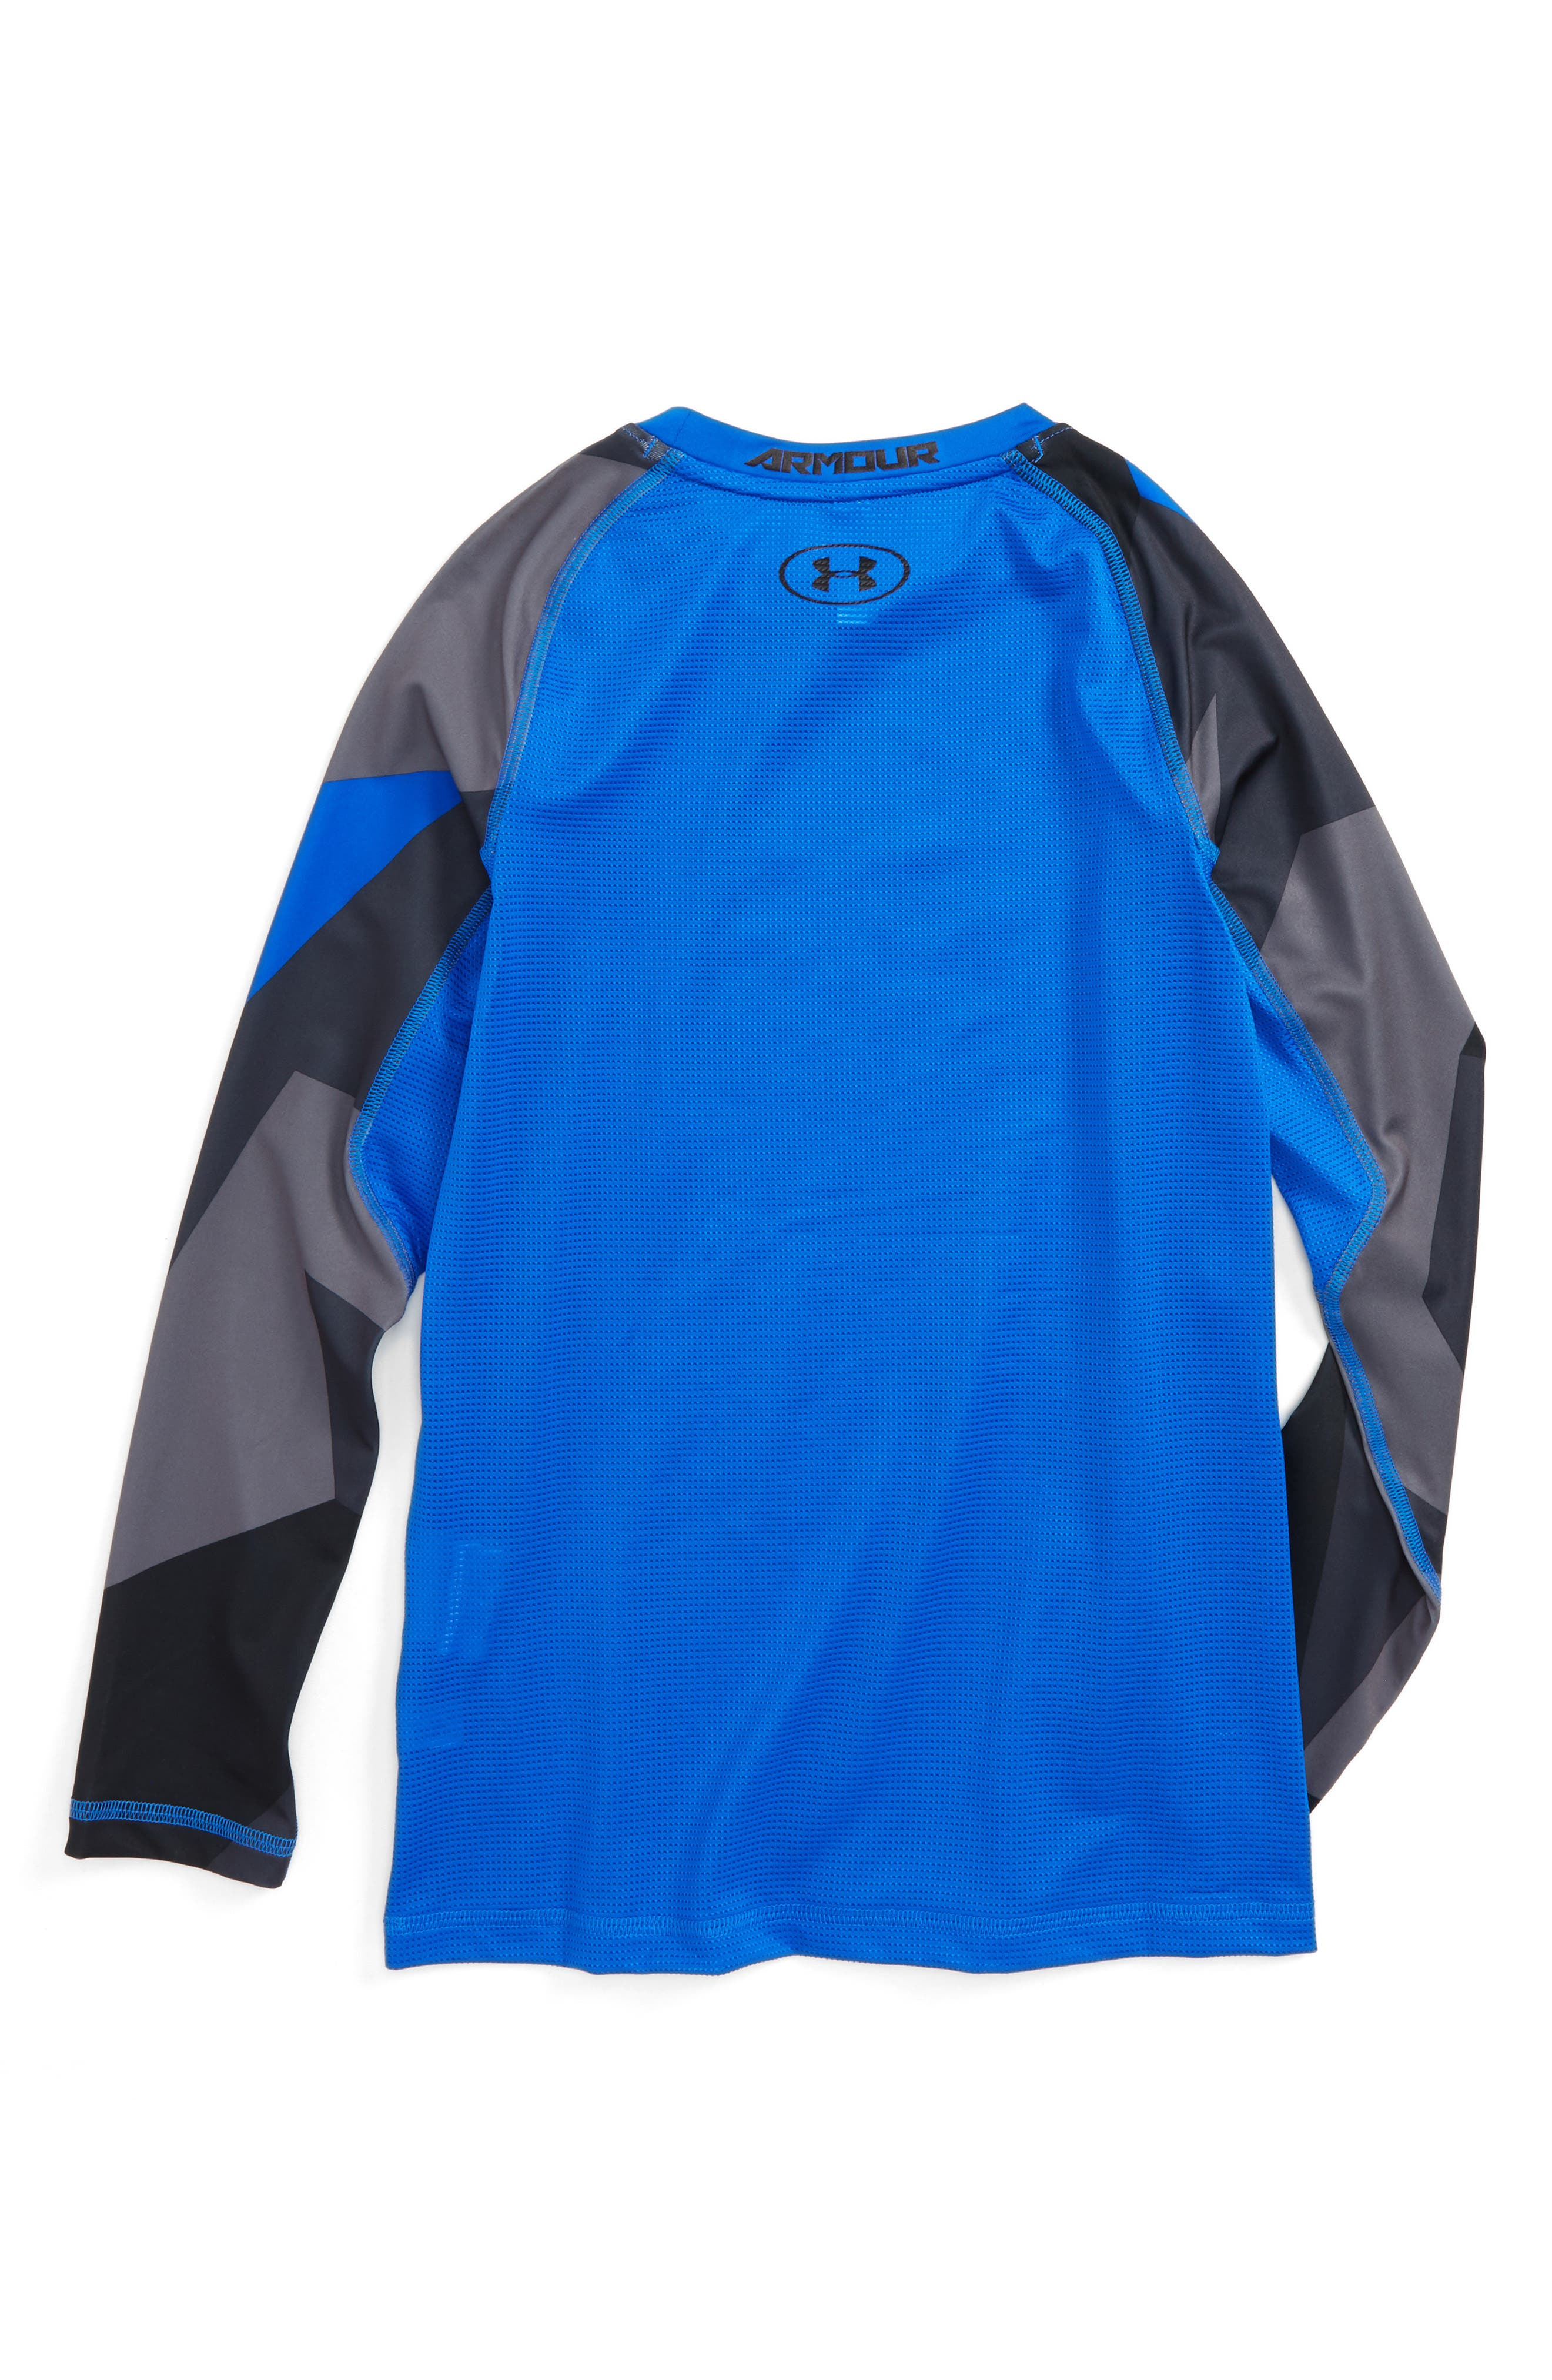 Novelty HeatGear<sup>®</sup> Shirt,                             Alternate thumbnail 2, color,                             Ultra Blue/ Black